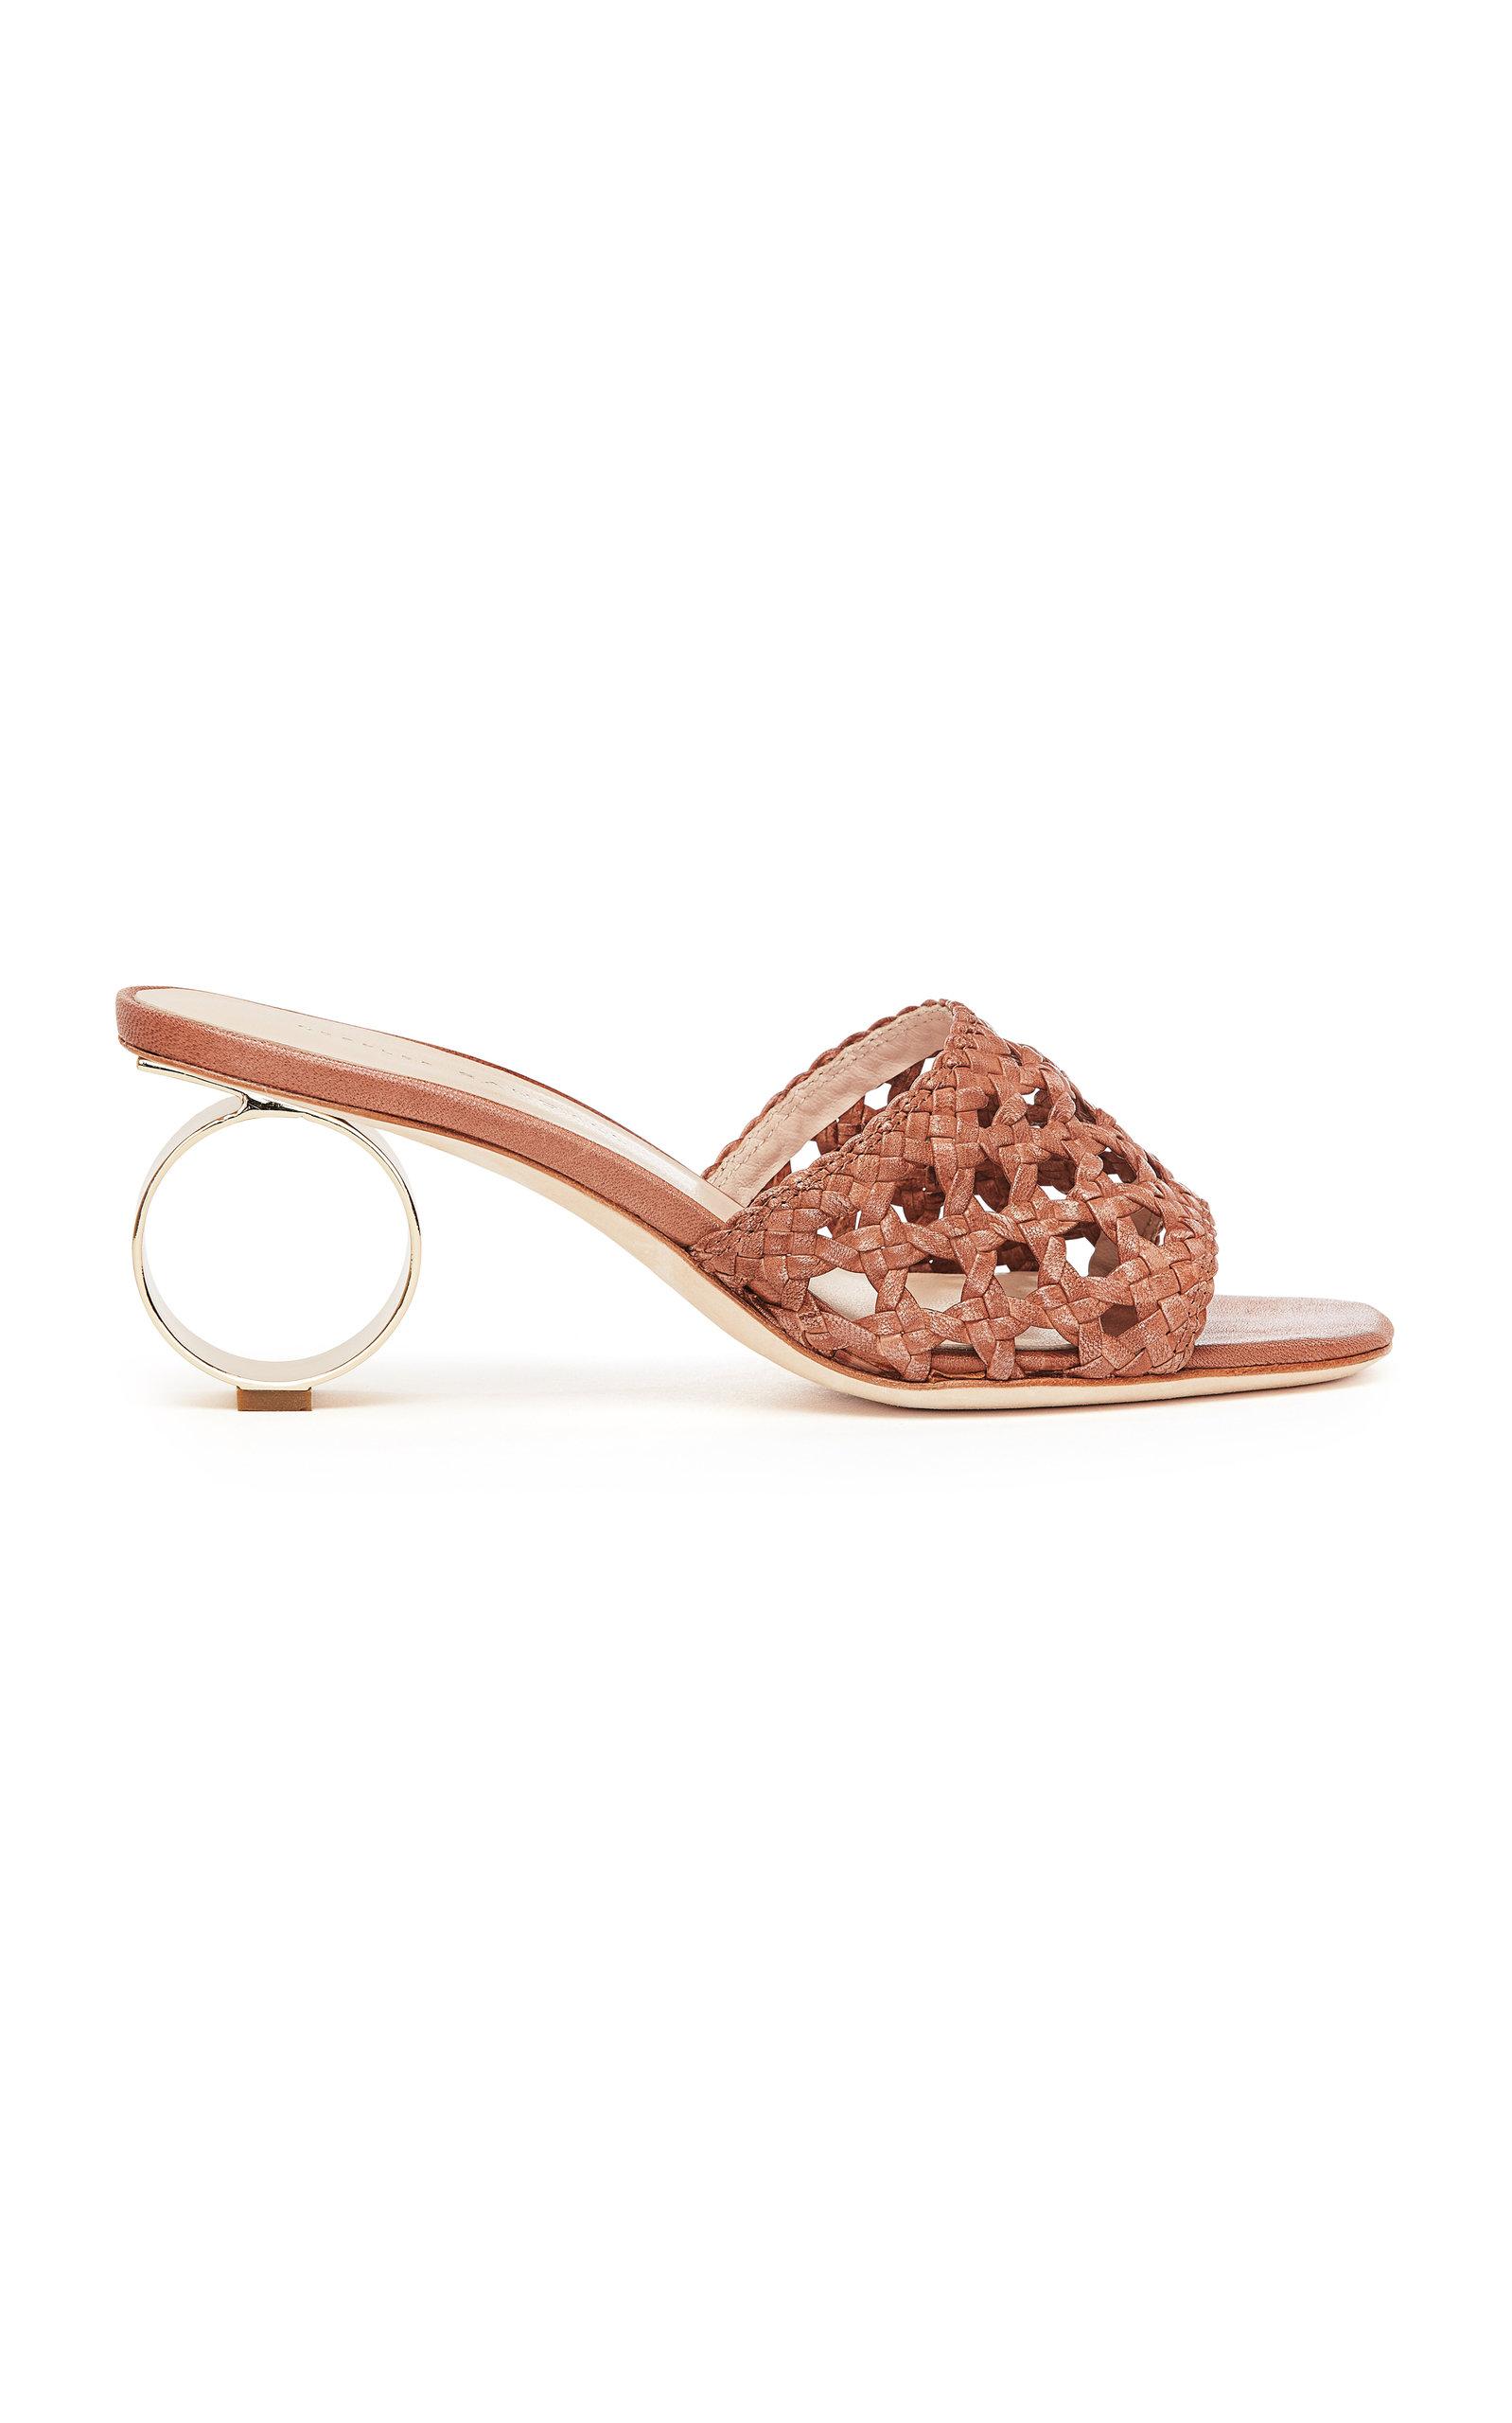 Sandals Heel Brette Leather In Brown Randall Loeffler Woven Accent qgwYntf